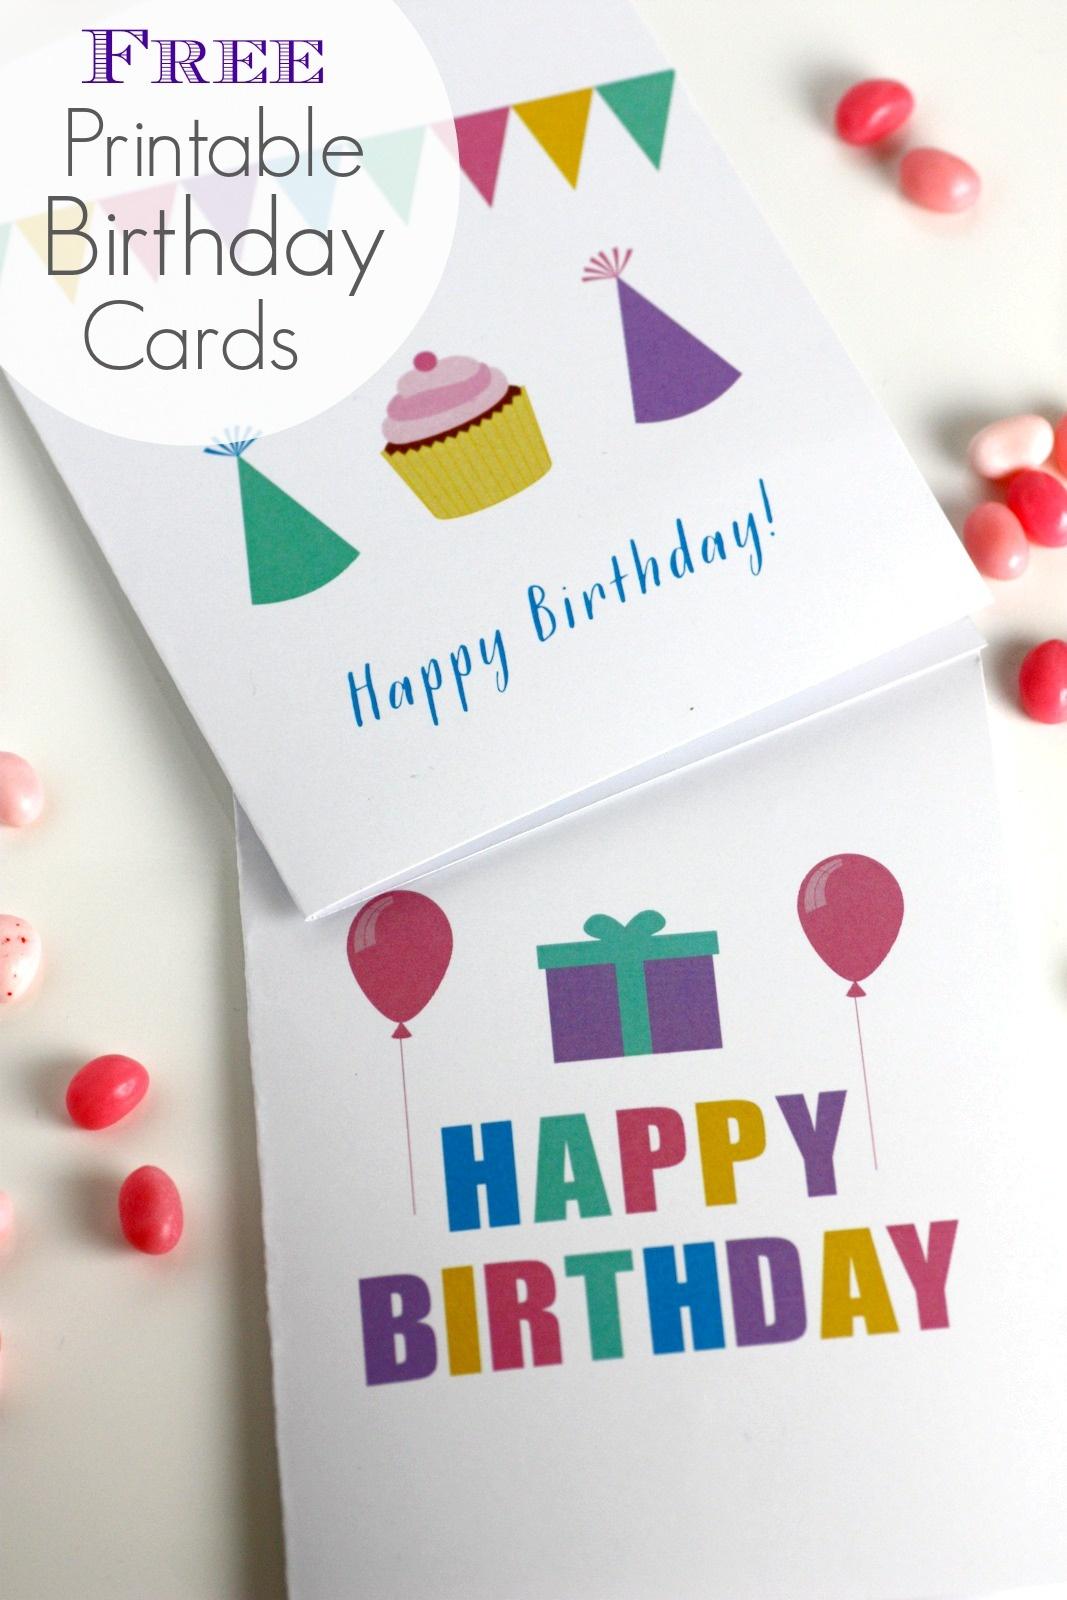 Free Printable Blank Birthday Cards | Catch My Party - Free Printable Birthday Cards For Adults